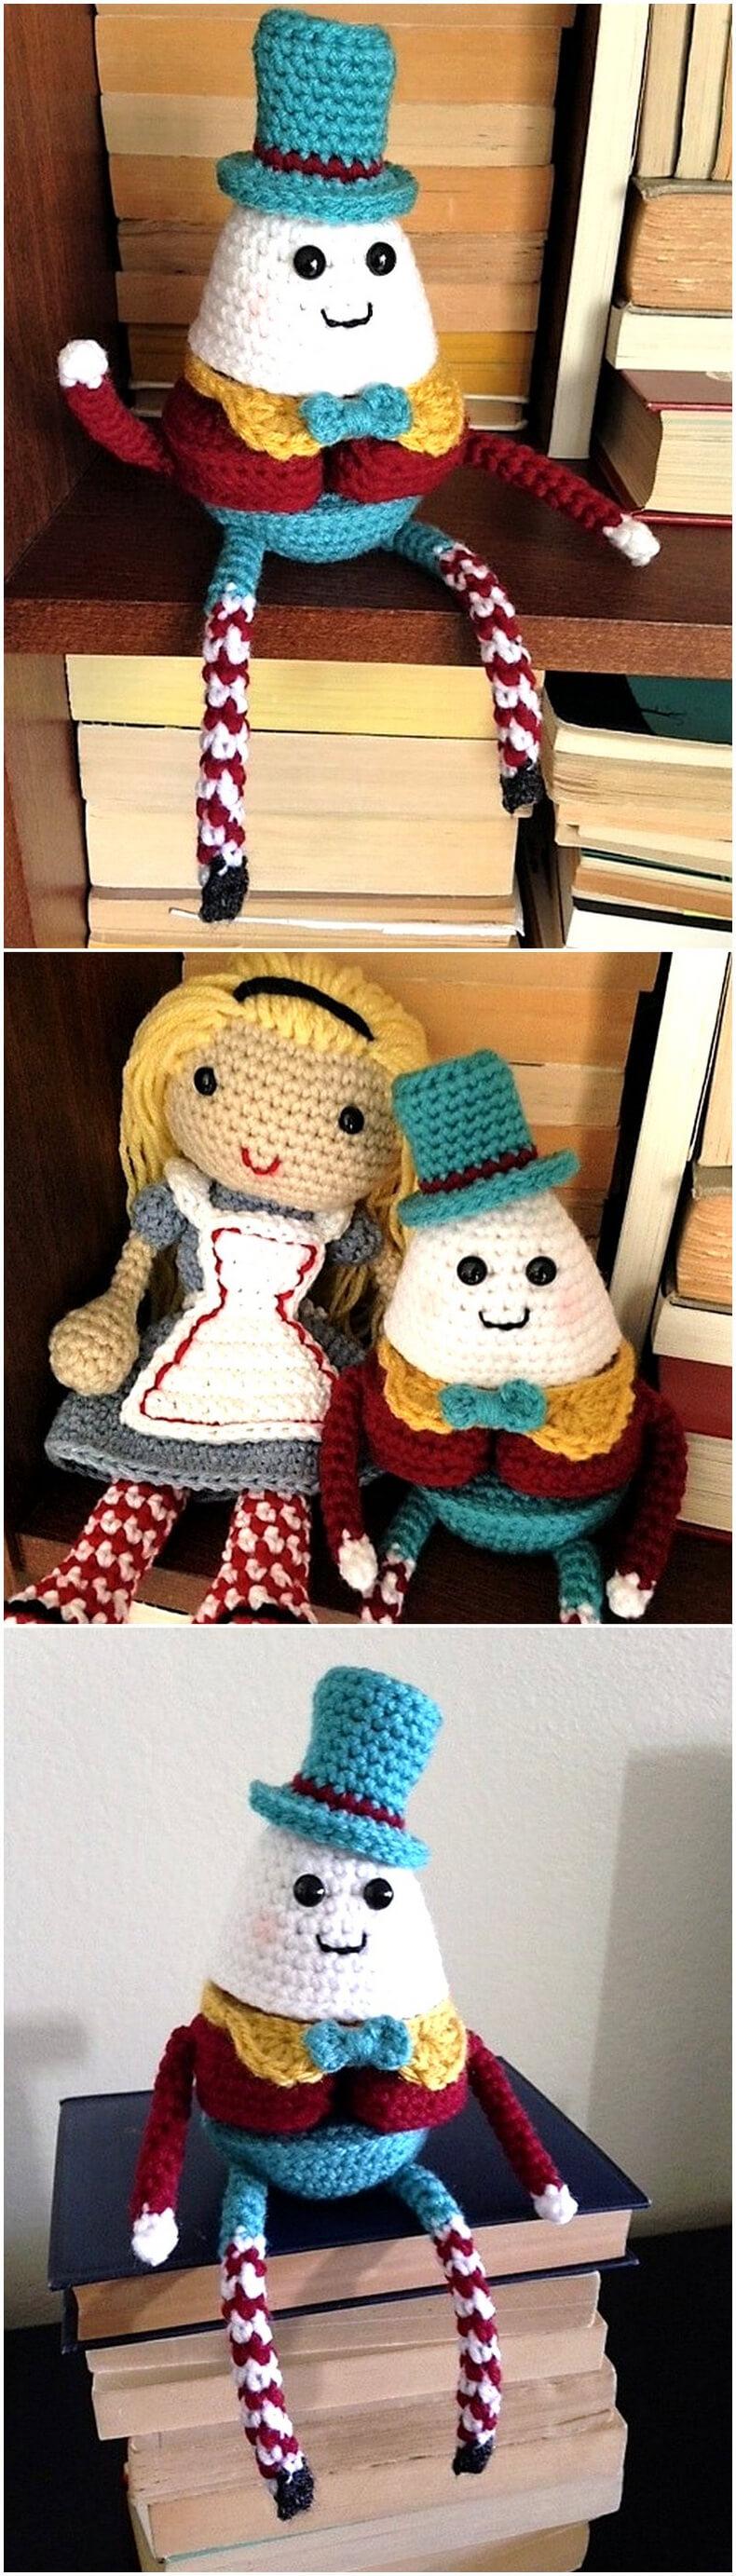 FREE PATTERN! Humpty Dumpty Puzzle Doll